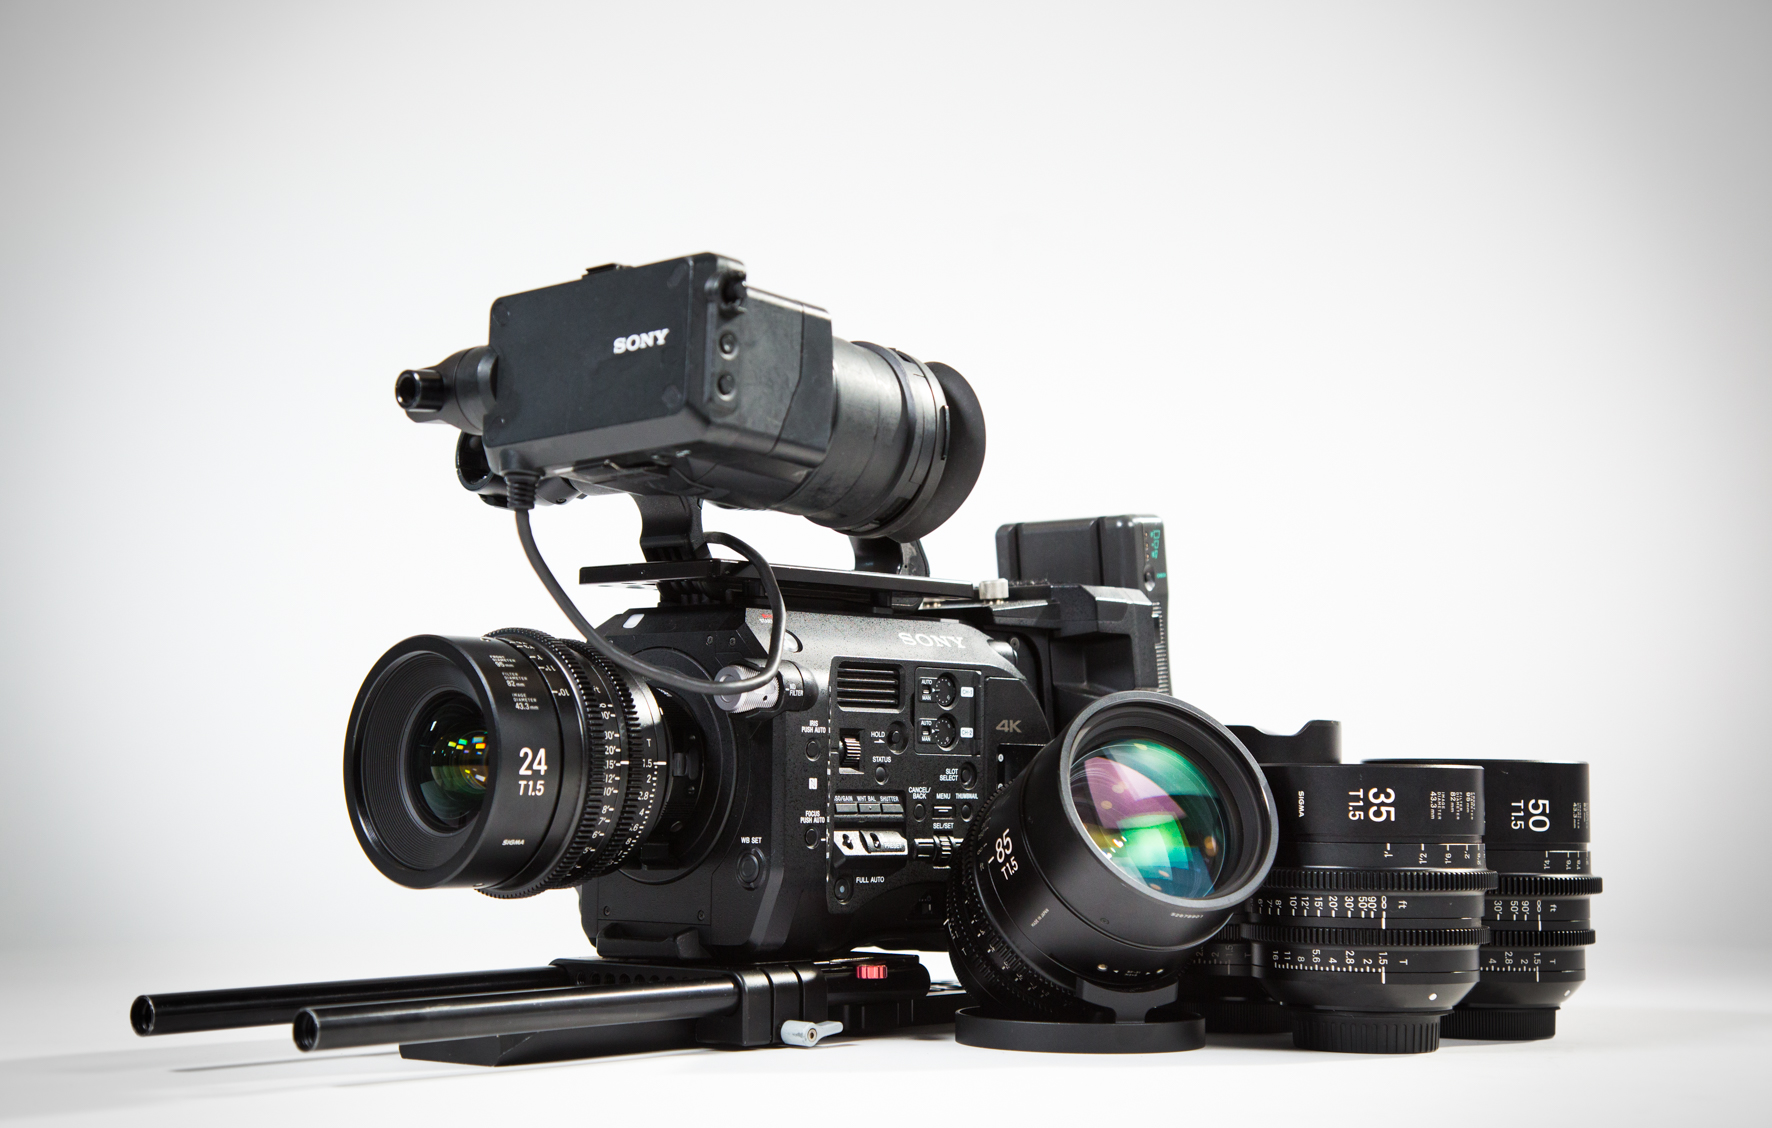 Sony Fs7 - Sigma Cine Prime Package